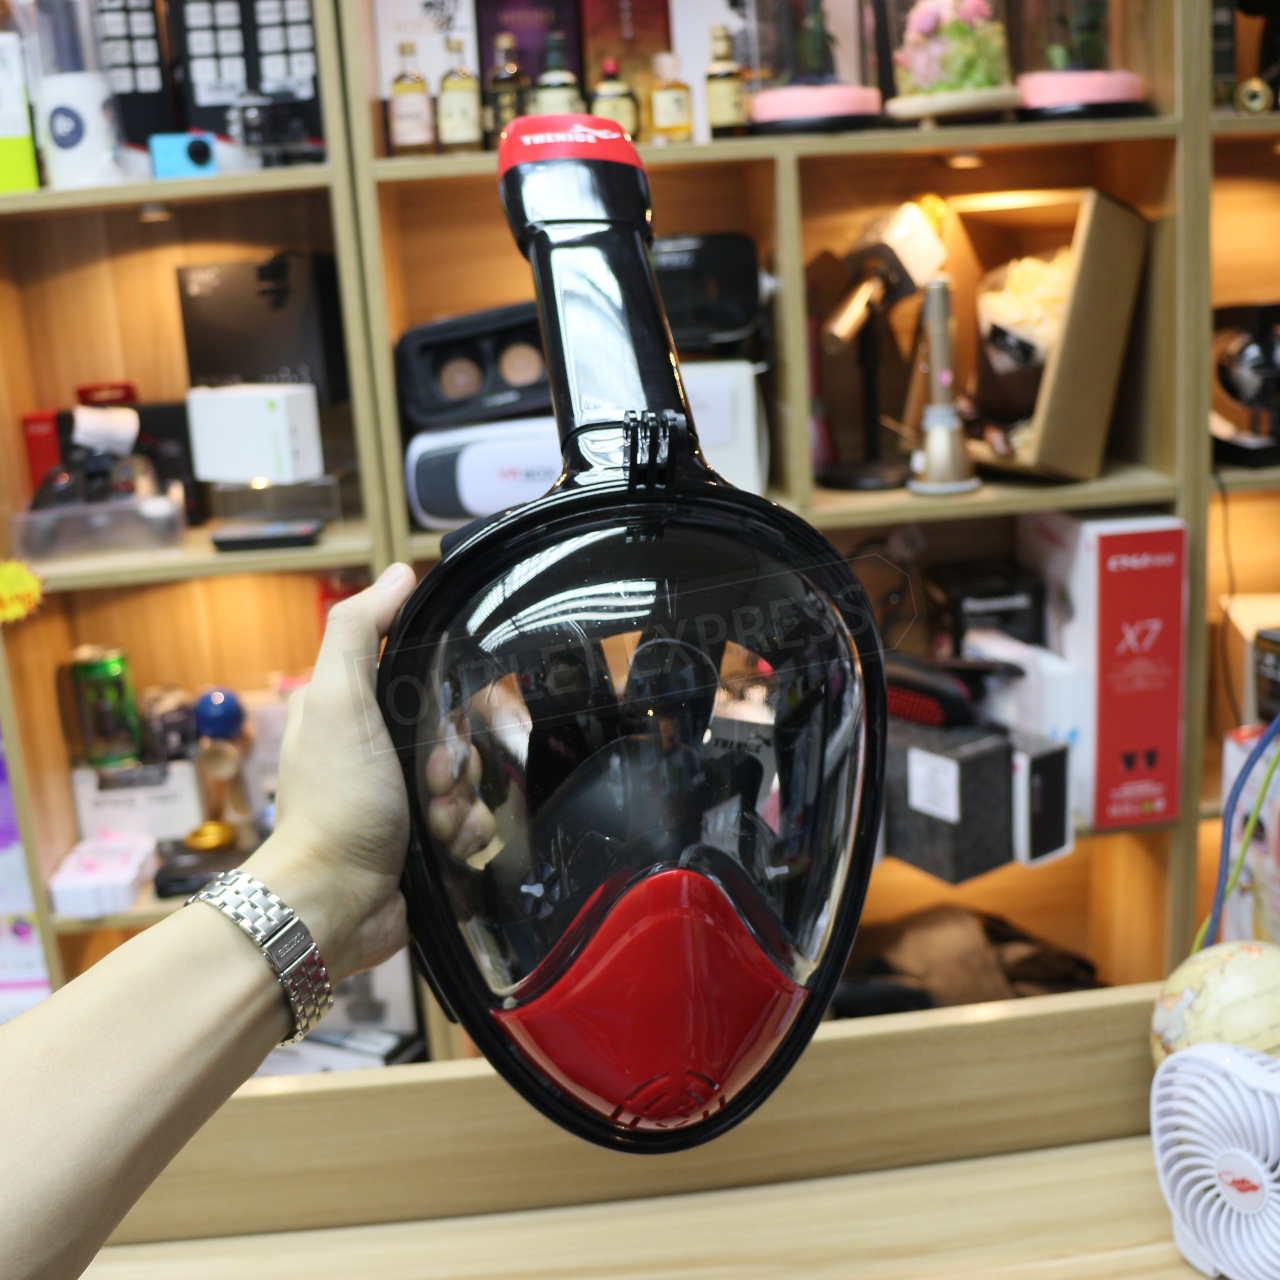 THENICE全乾式防霧浮潛面罩 正面- Outlet Express HK生活百貨城實拍相片